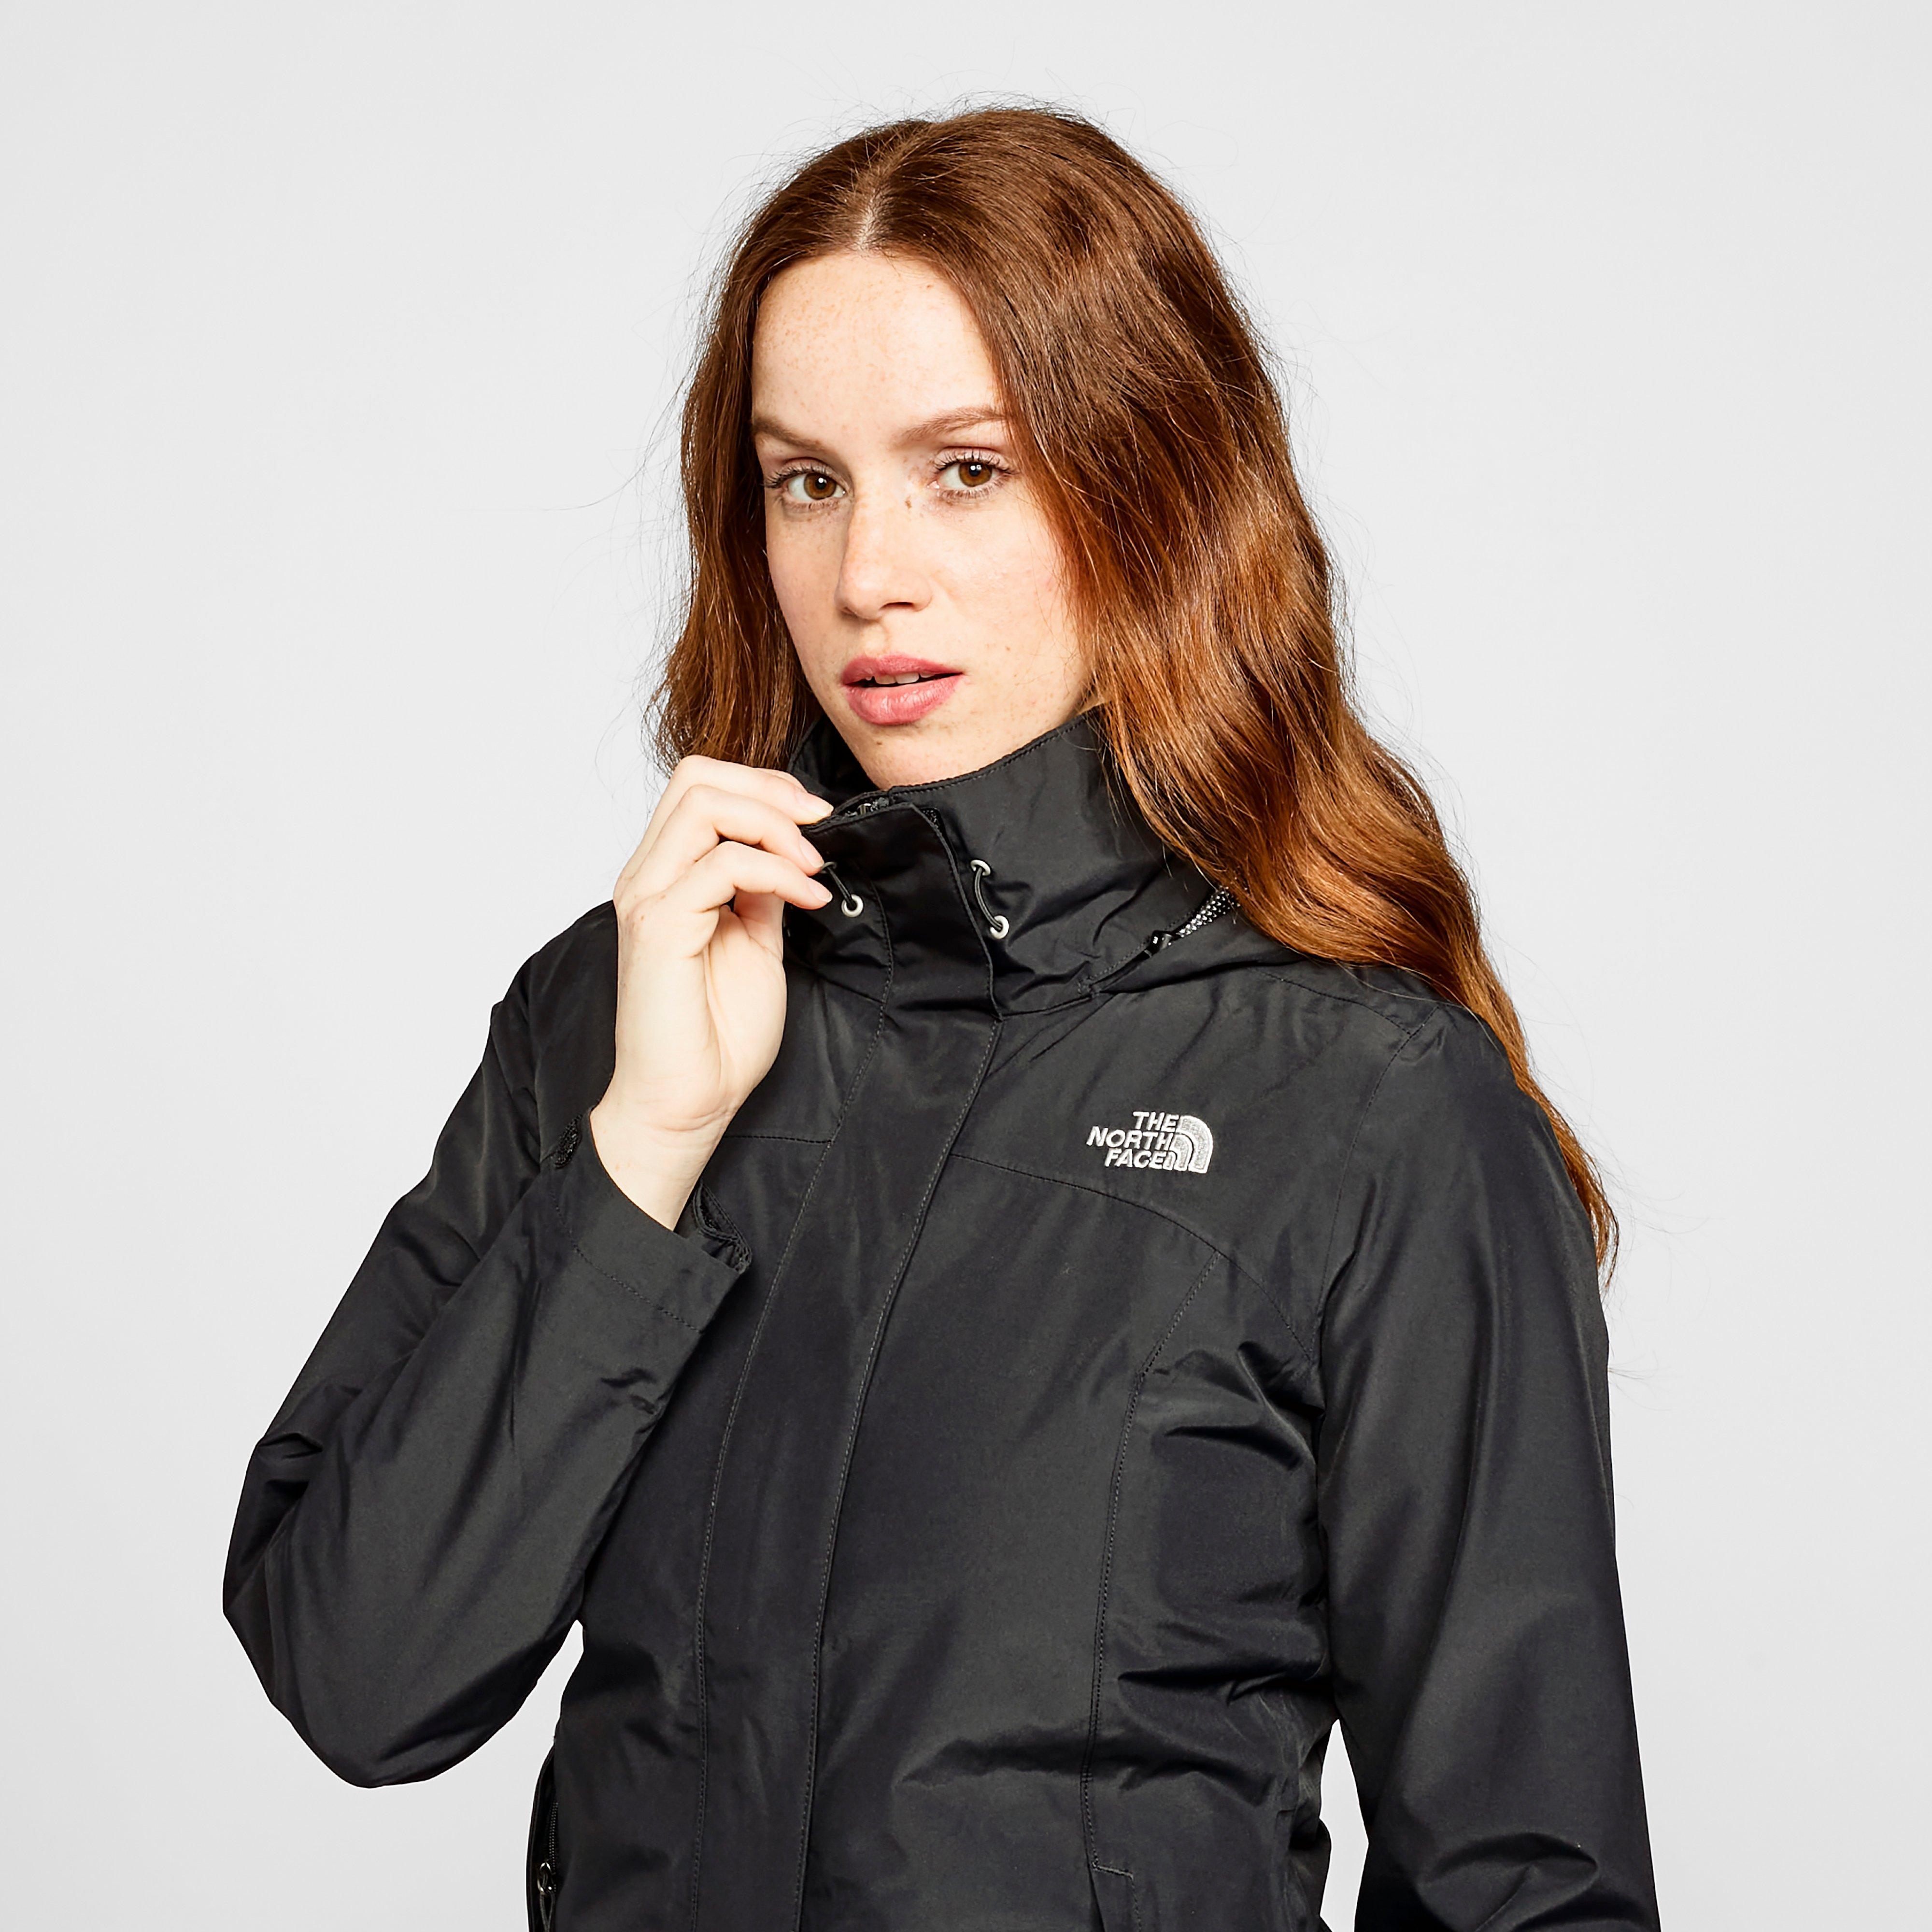 north face jacket woman